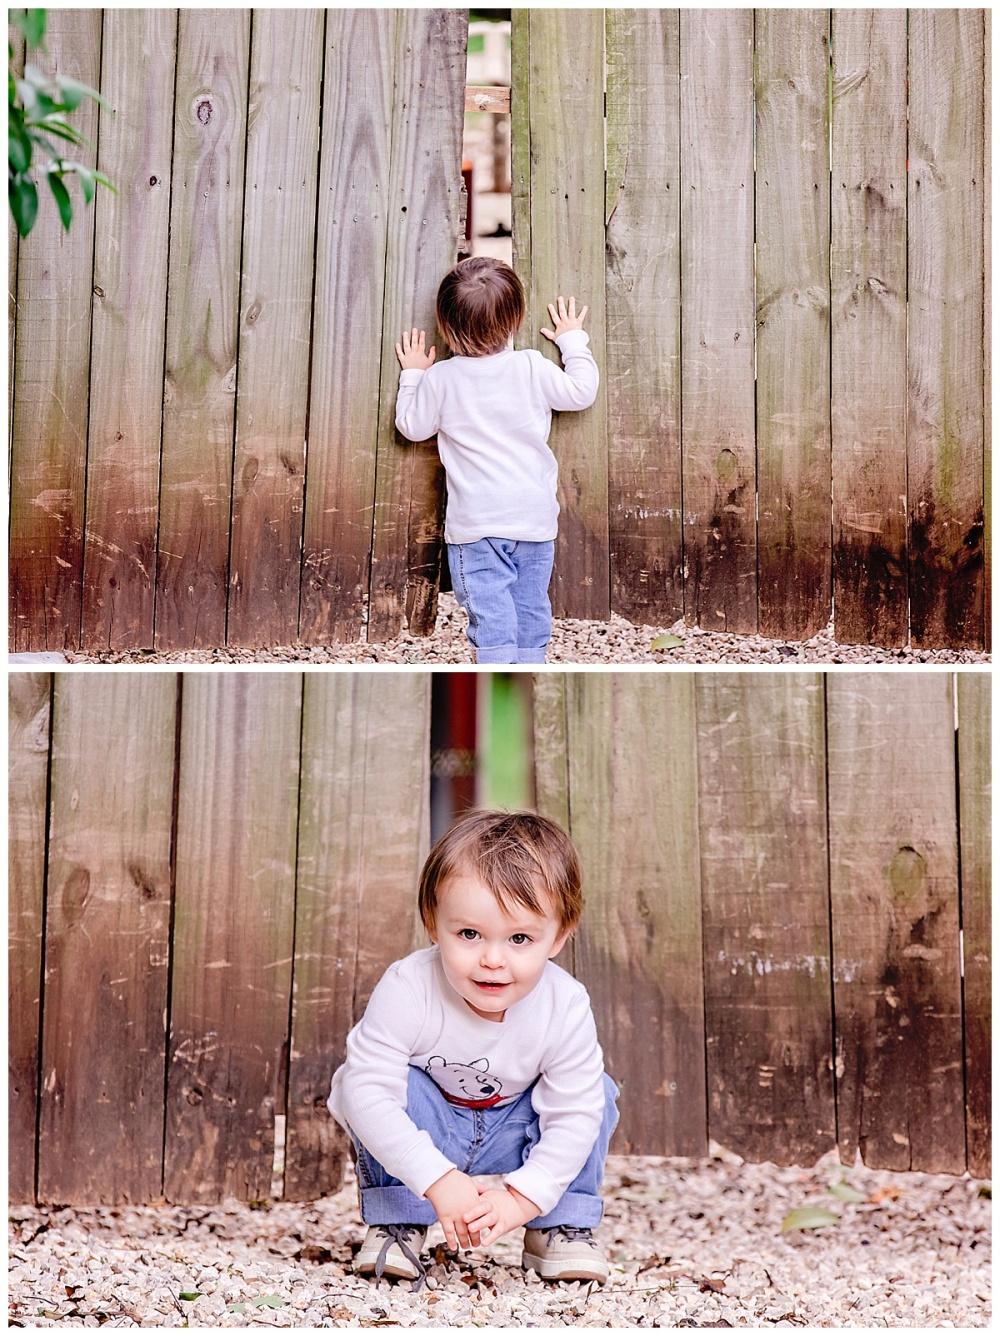 Family-Photographer-Gruene-Texas-Fall-Carly-Barton-Photography_0012.jpg